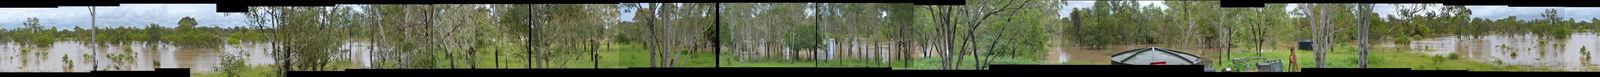 2011:01:06 flood panarama